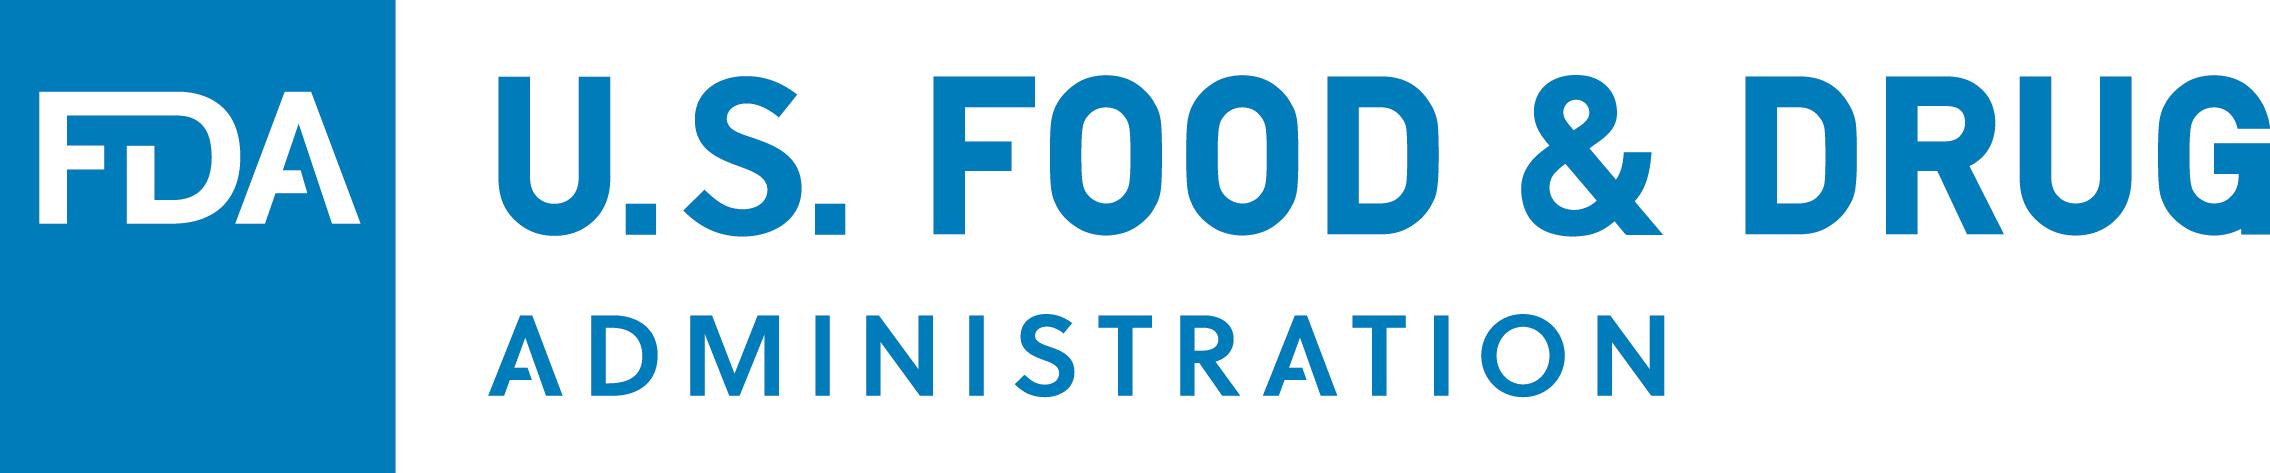 fda-header-brand.png